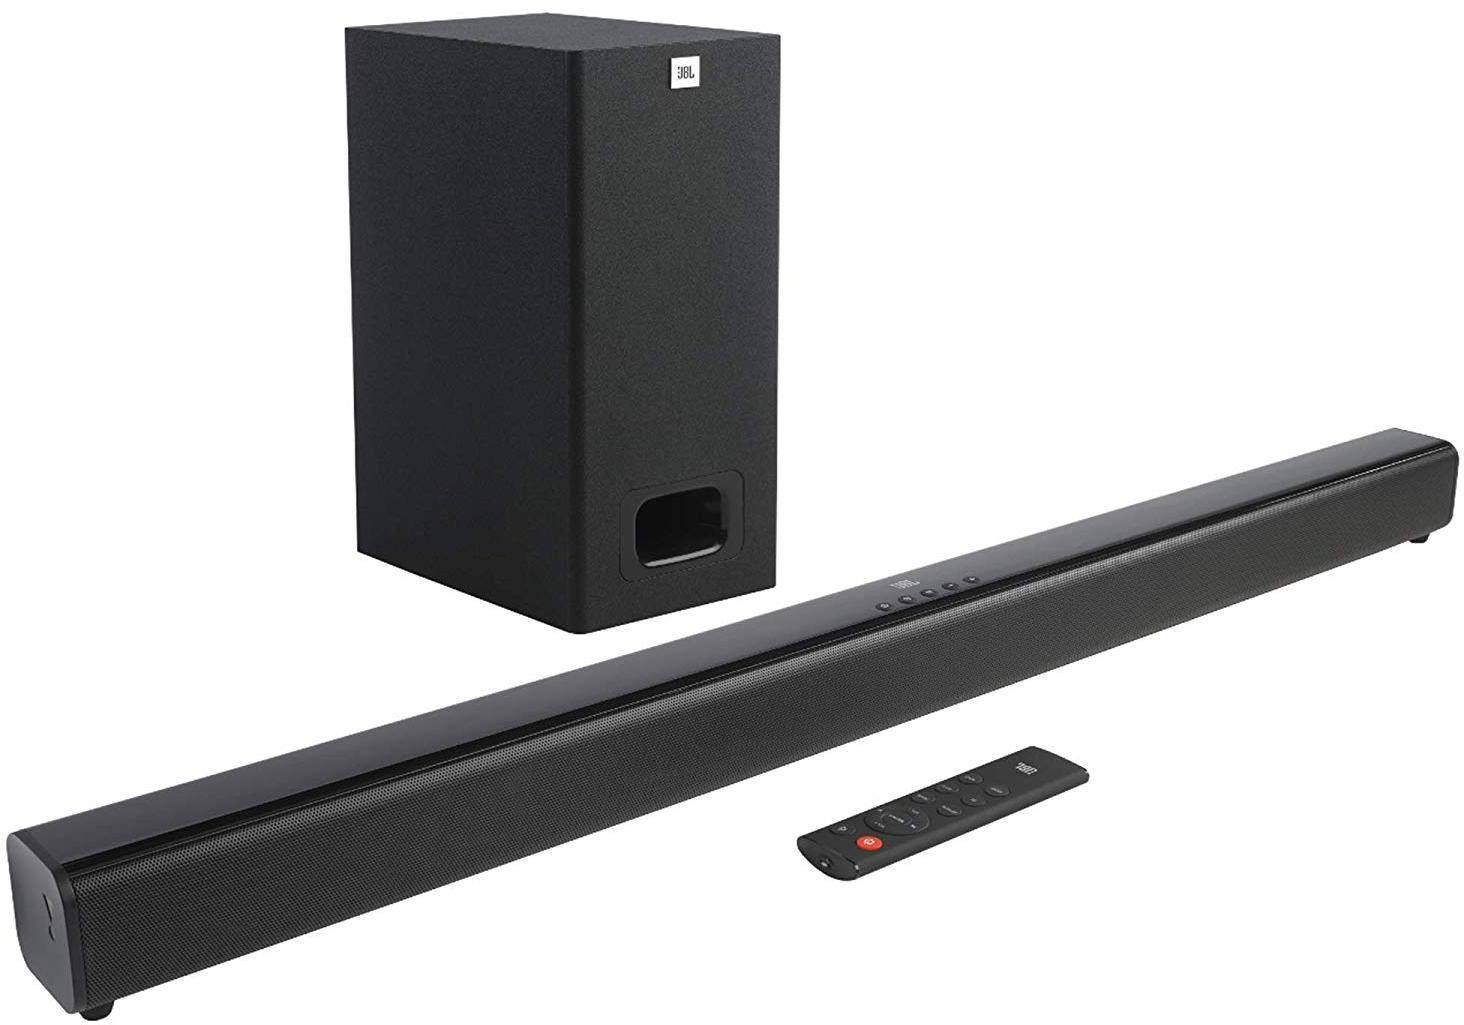 JBL Cinema SB130 2.1 Channel Soundbar With Wired Subwoofer (110W, Dolby Digital, Extra Punchy Bass) zoom image